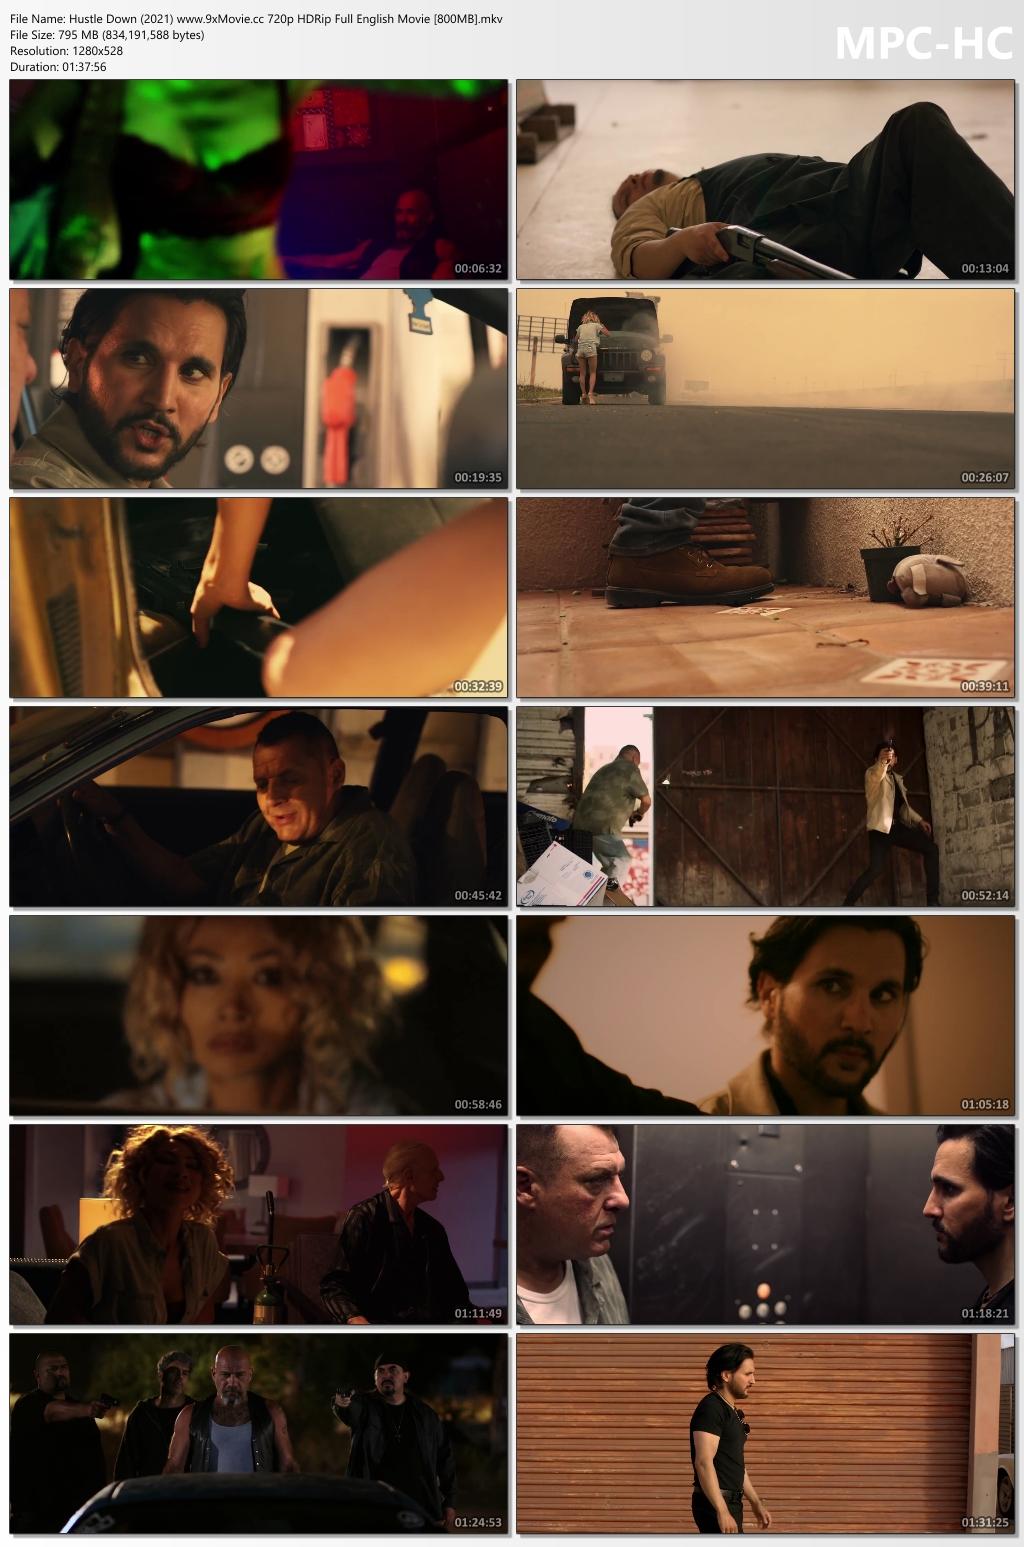 Hustle-Down-2021-www-9x-Movie-cc-720p-HDRip-Full-English-Movie-800-MB-mkv